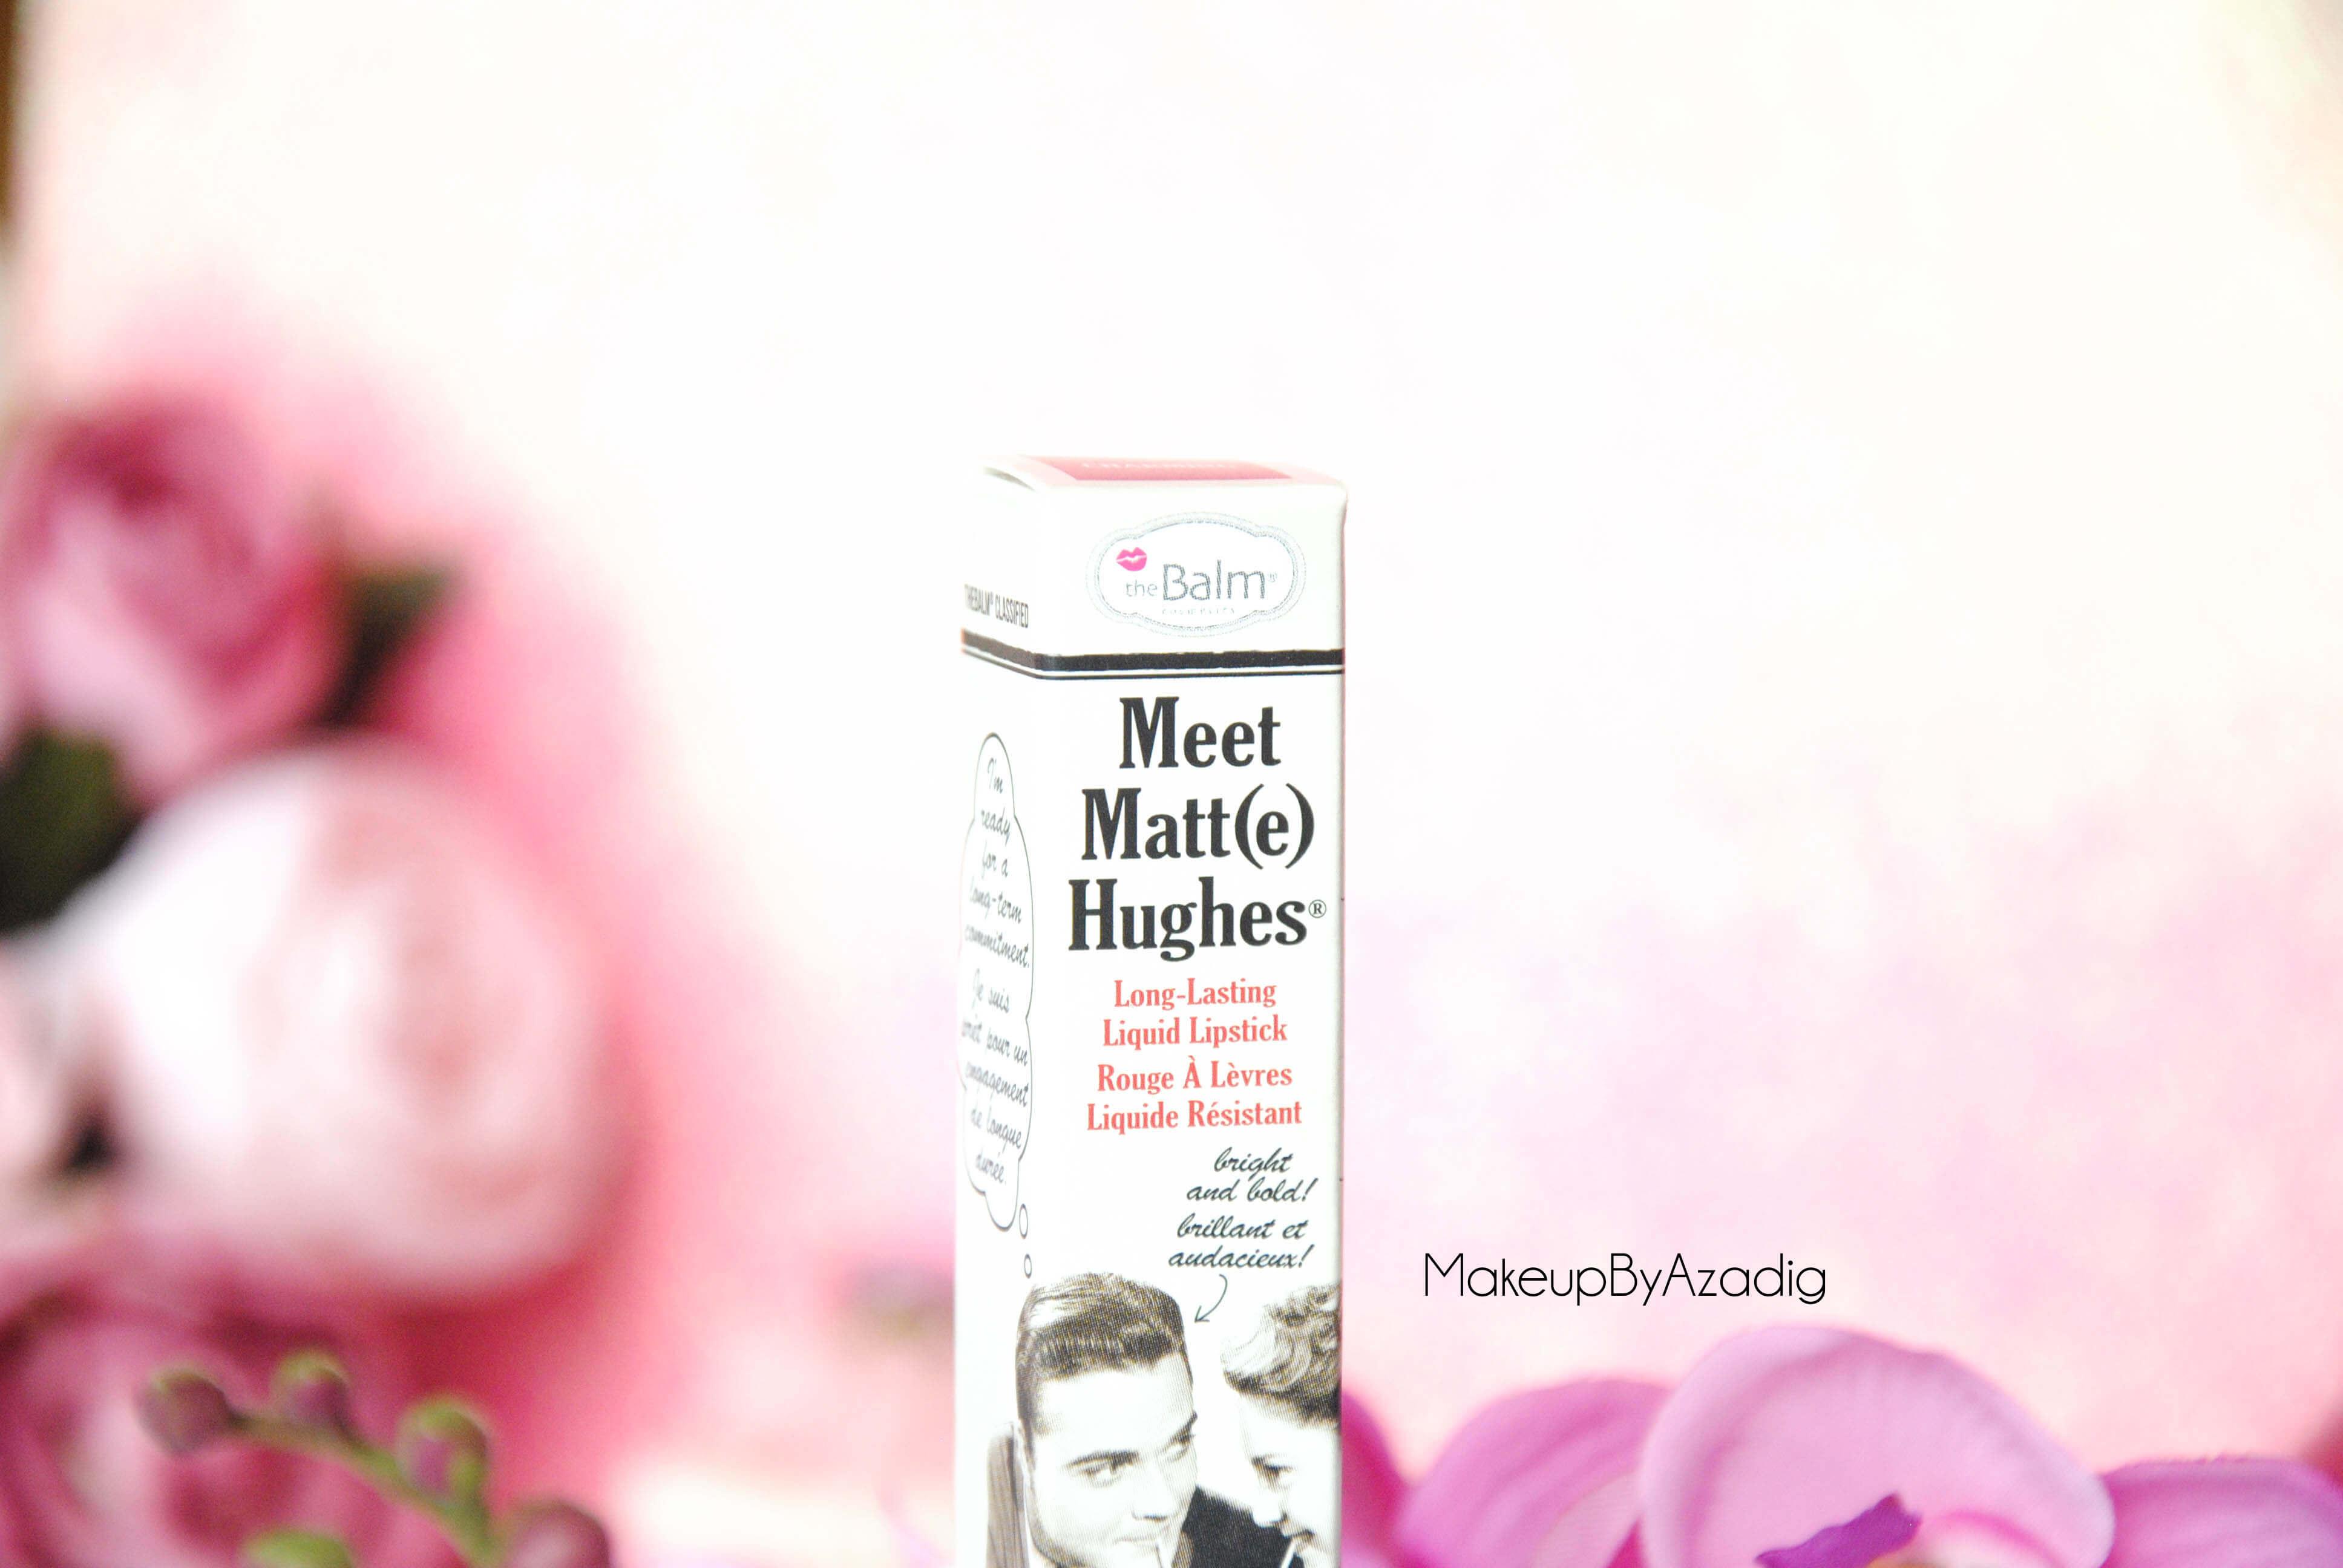 meet-matte-hughes-the-balm-charming-makeupbyazadig-troyes-paris-rouge-levres-liquide-swatch-review-avis-lasting